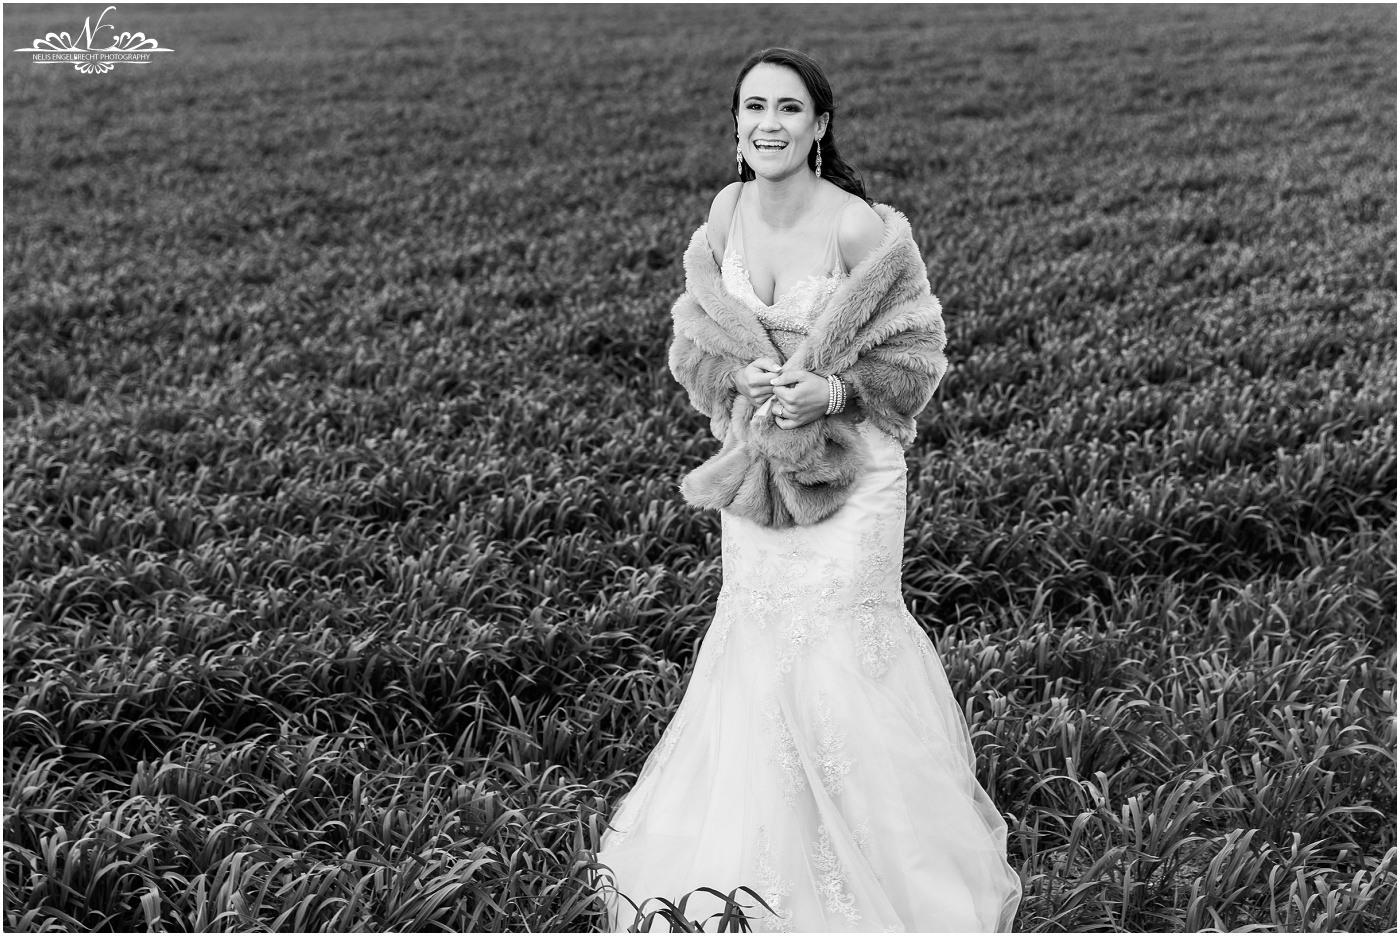 Eensgezind-Wedding-Photos-Nelis-Engelbrecht-Photography-115